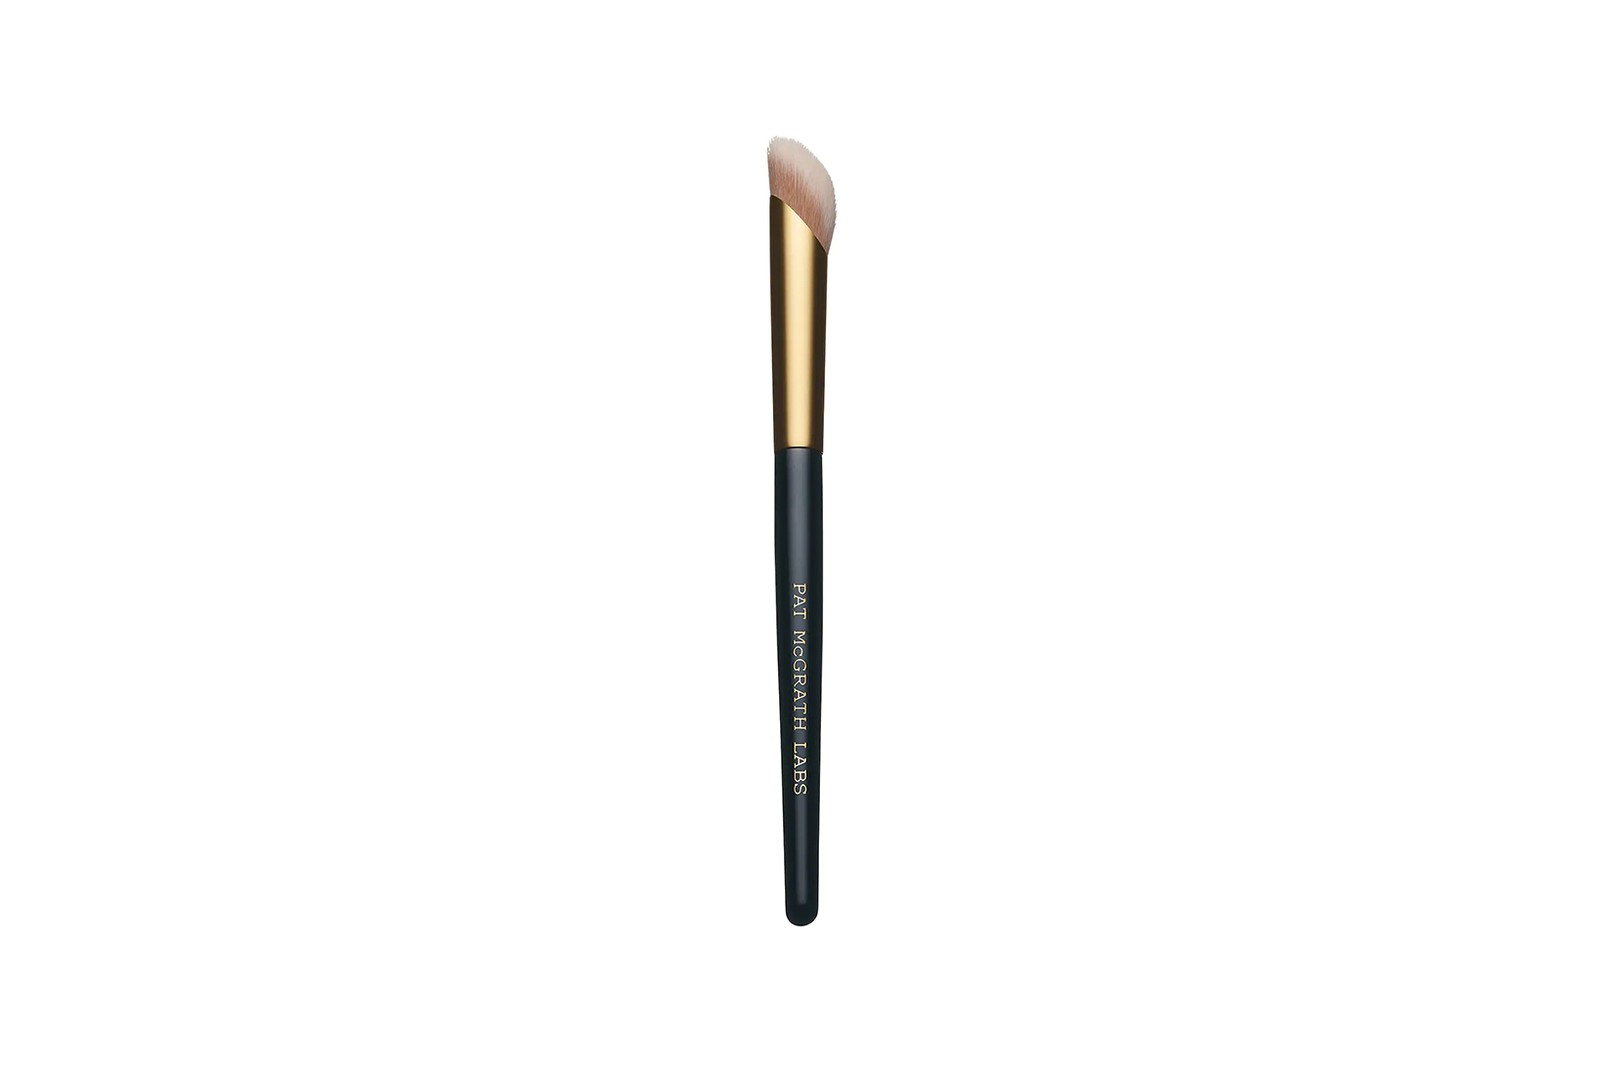 best makeup brushes benefit tom ford charlotte tilbury sephora collection morphe zoeva